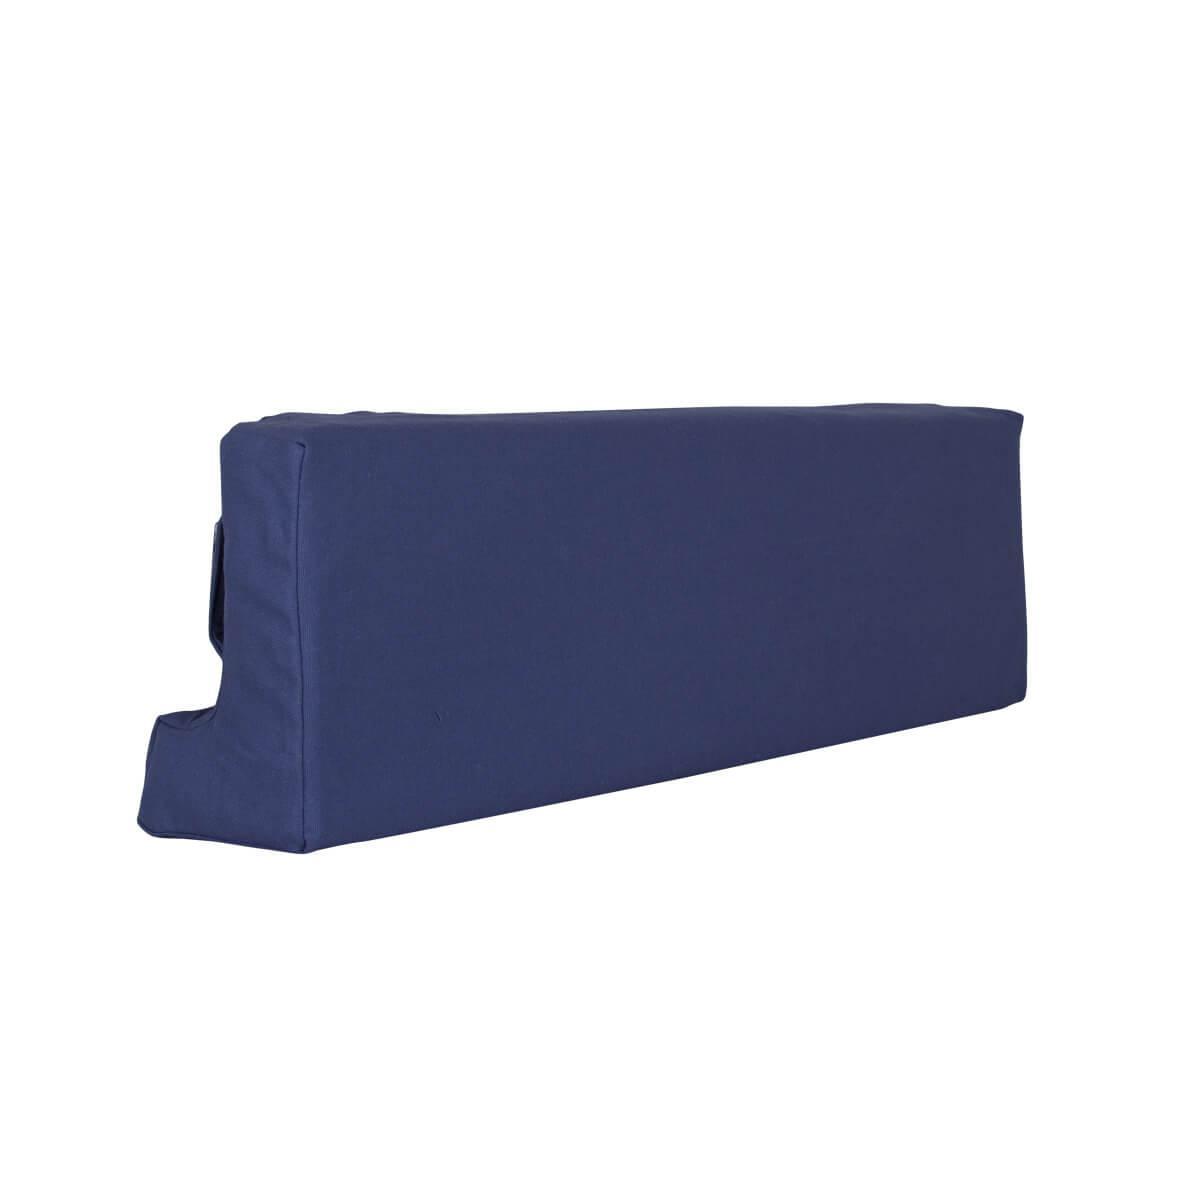 Zargenpolster DESTYLE de Breuyn dunkelblau